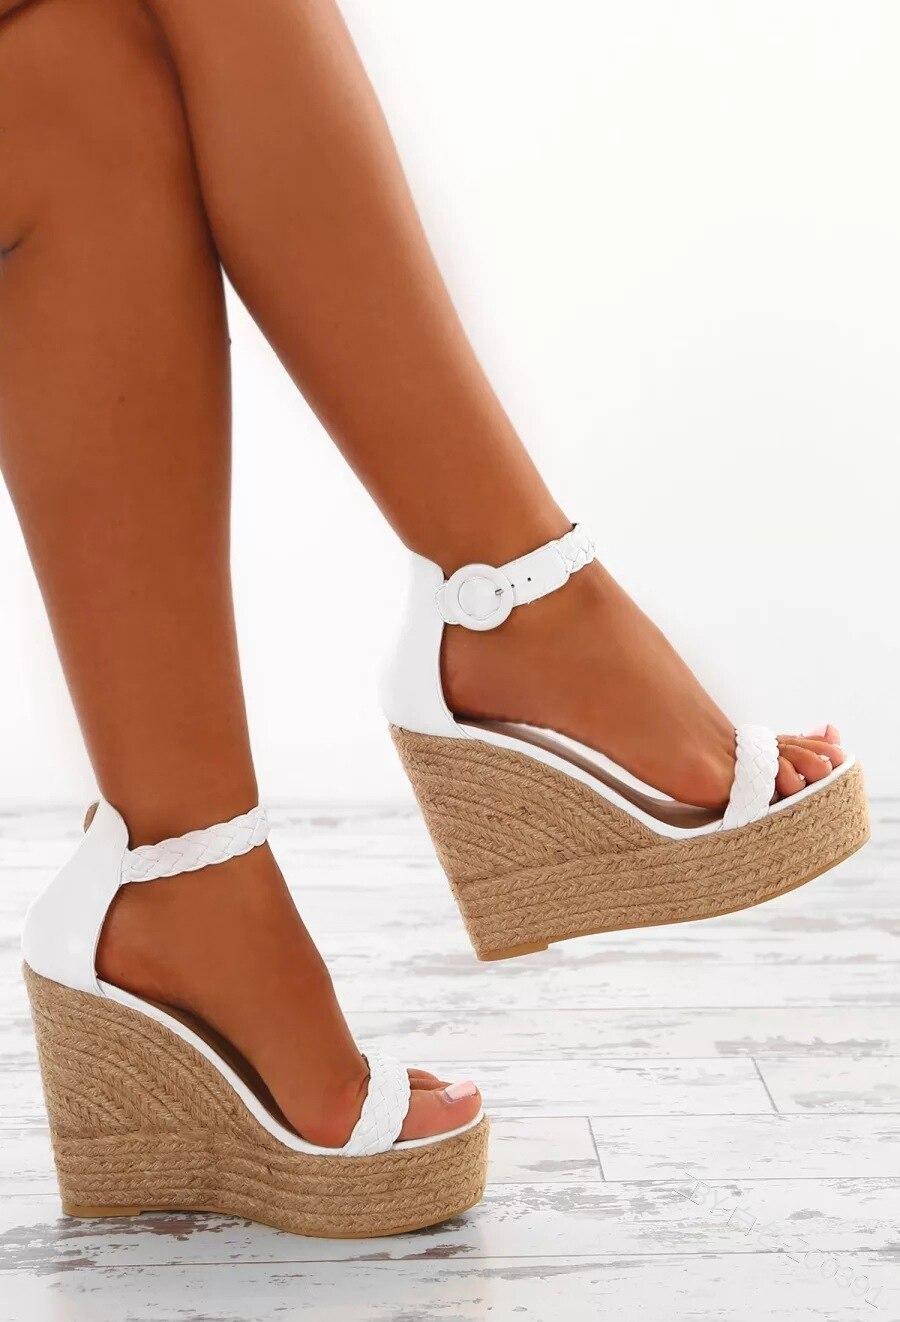 Summer Fashion Ultra High Heel Waterproof Platform Sandals